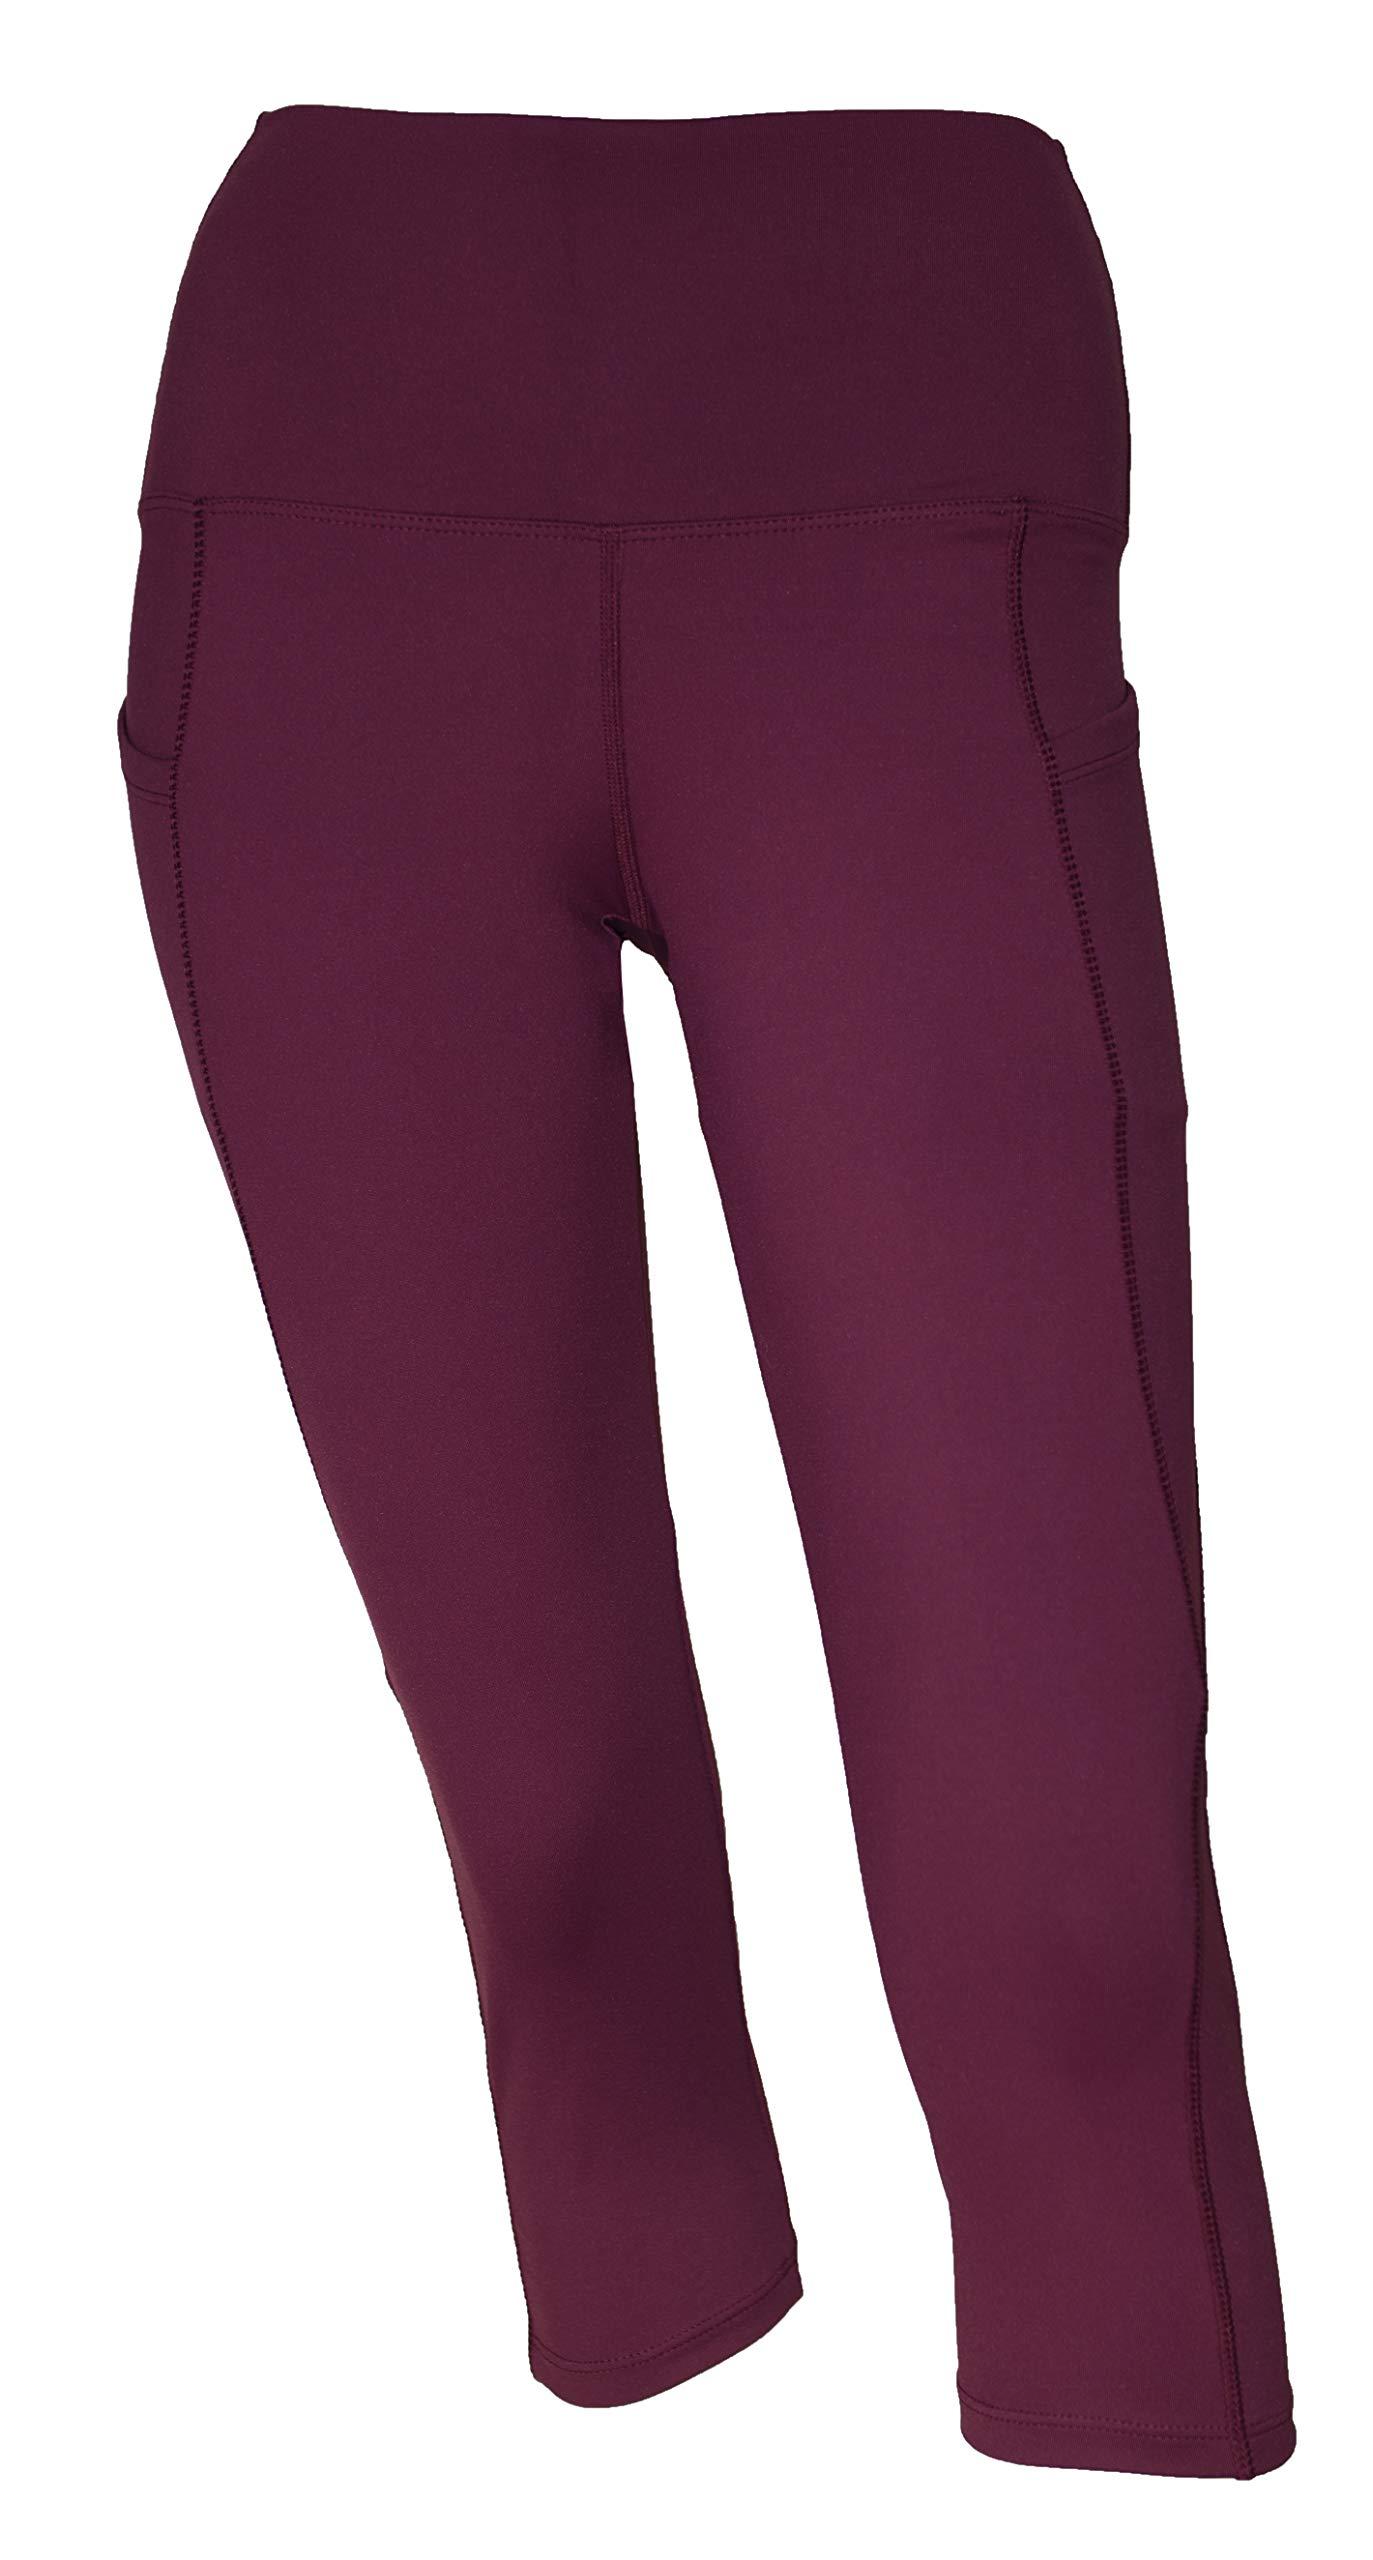 Private Island Women Swim Pockets Pants for UV Rashguard (Large, Dark Wine) by Private Island